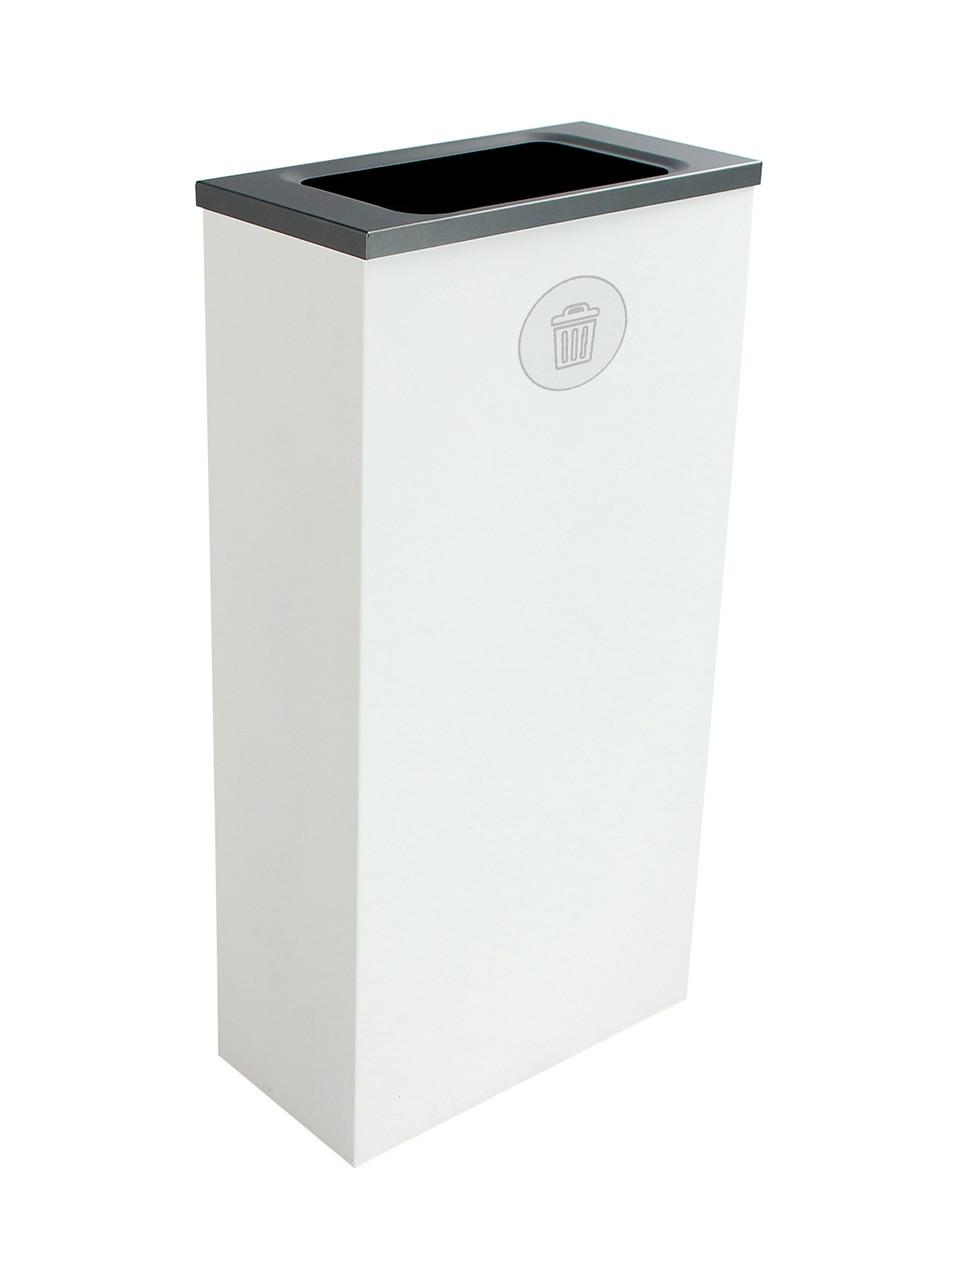 10 Gallon Steel Spectrum Slim Trash Can White 8107069-4